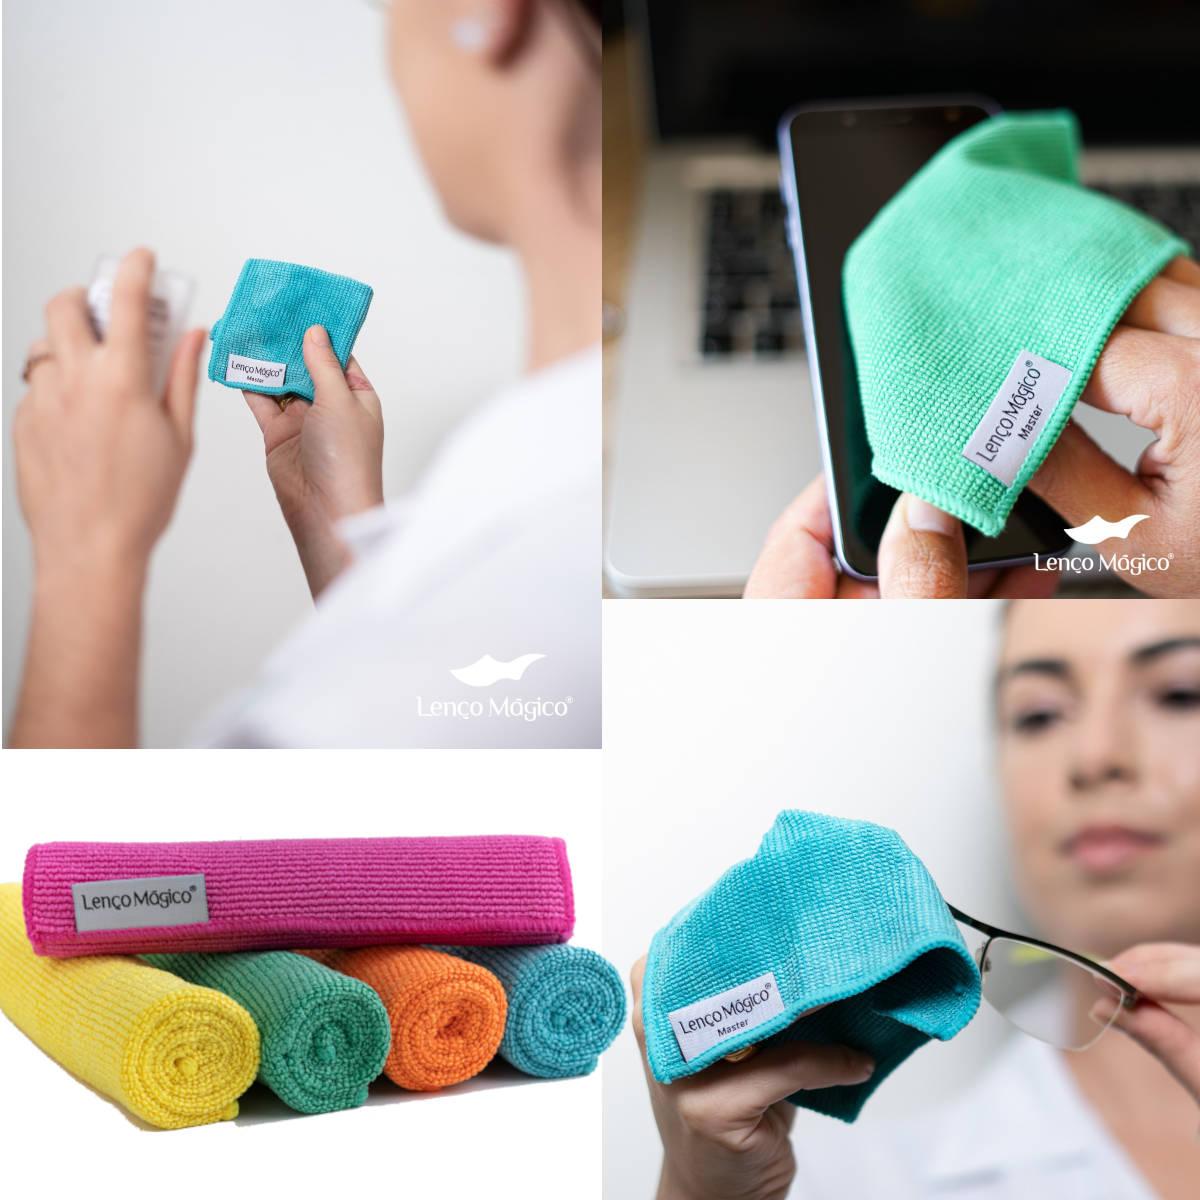 Kit 2 limpa lentes slim + 1 Lenço mágico master